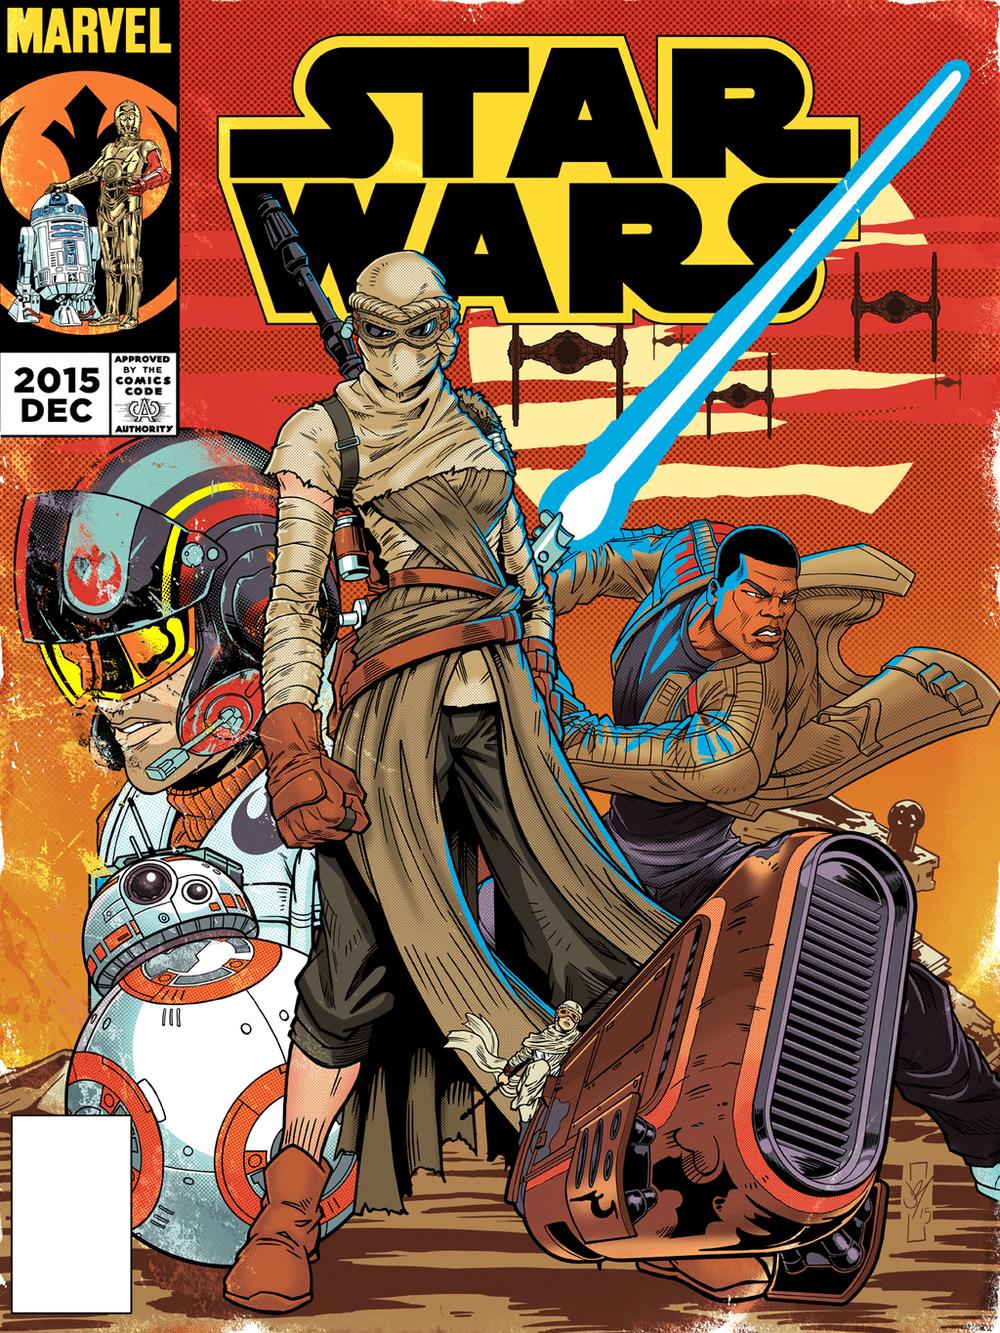 star wars hd printable poster wallpaper comic book poster